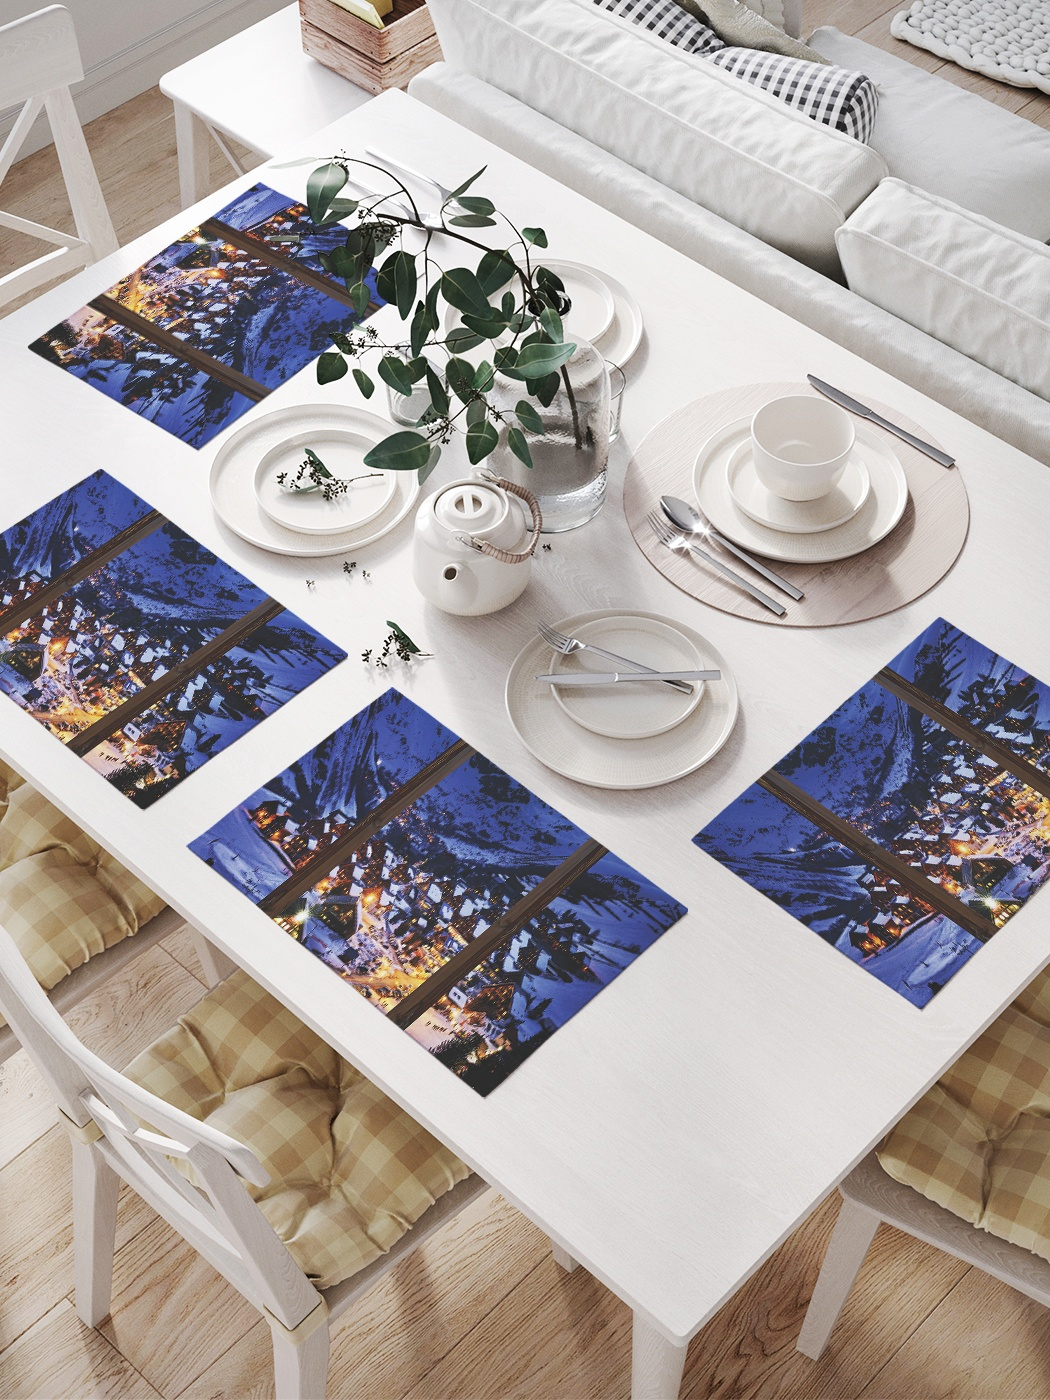 Комплект салфеток для сервировки стола «Окно Рождества» (32х46 см, 4 шт.)